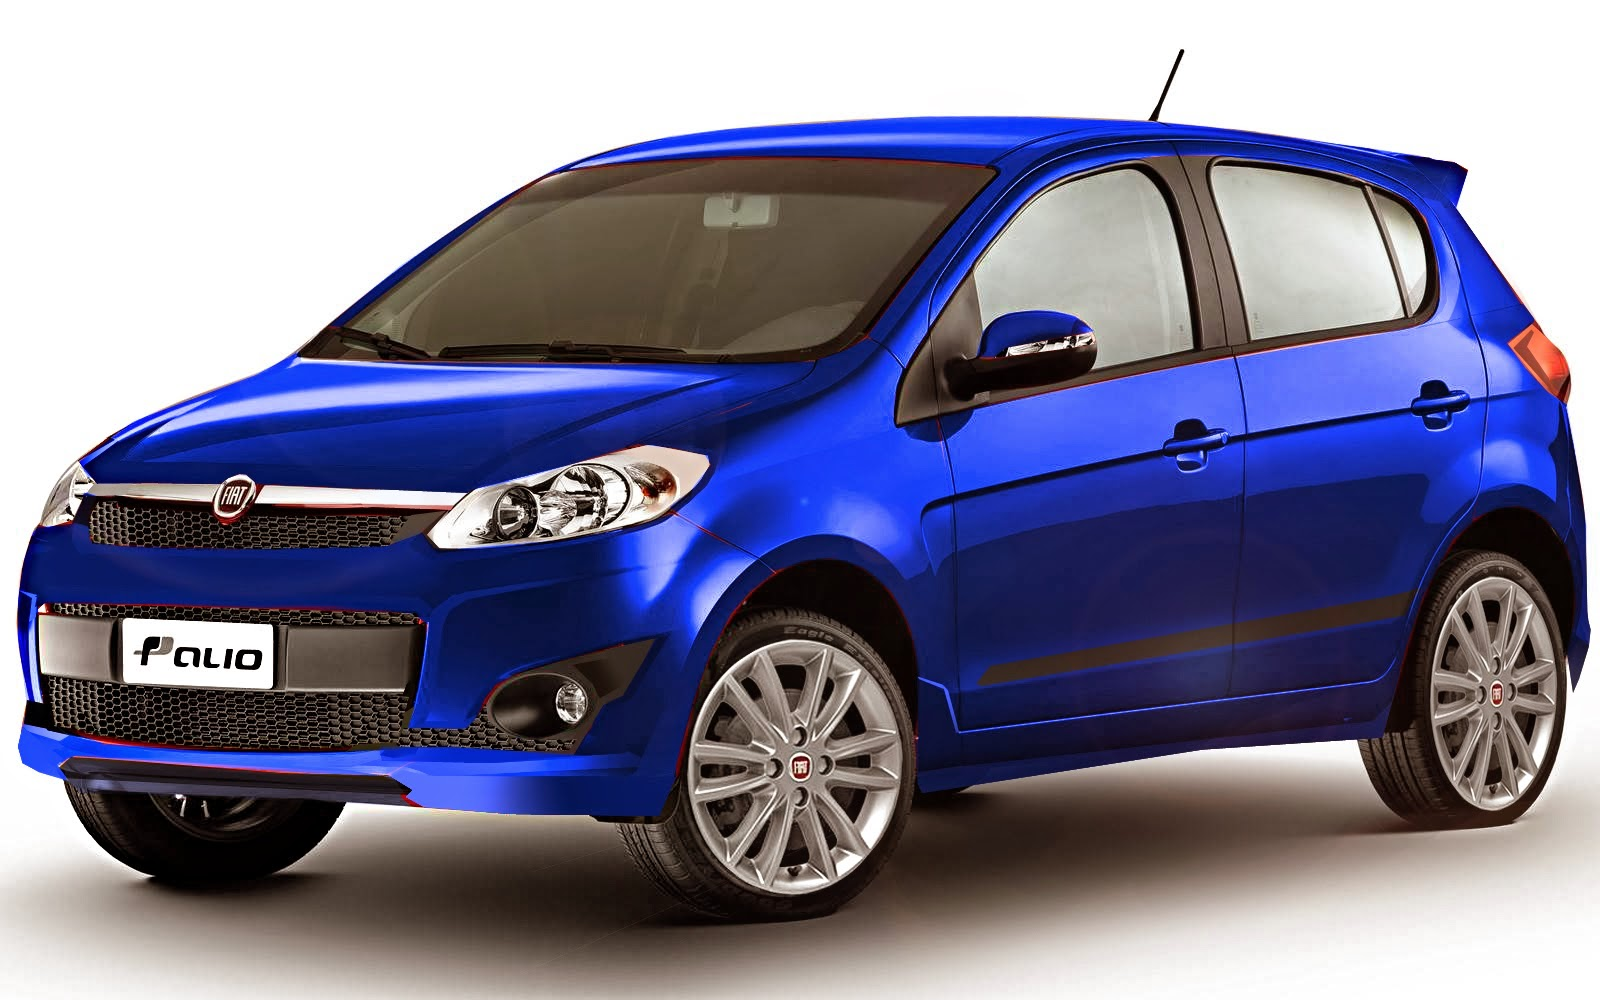 Carros mais Vendidos Novembro 2014 - Carros 2016 2015